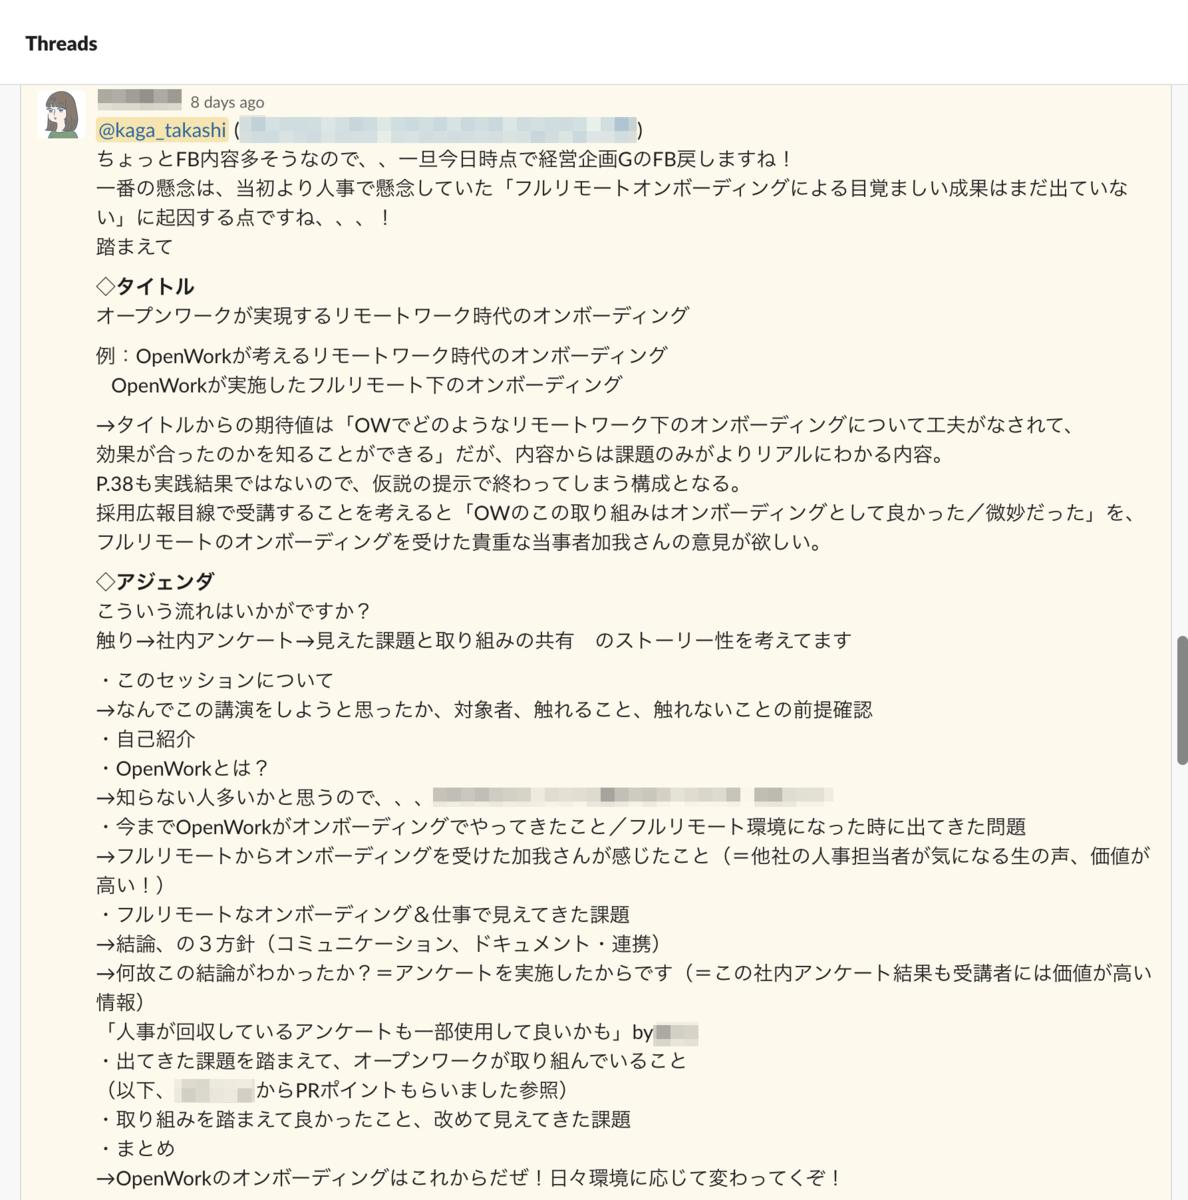 f:id:openwork_engineer:20200730110104p:plain